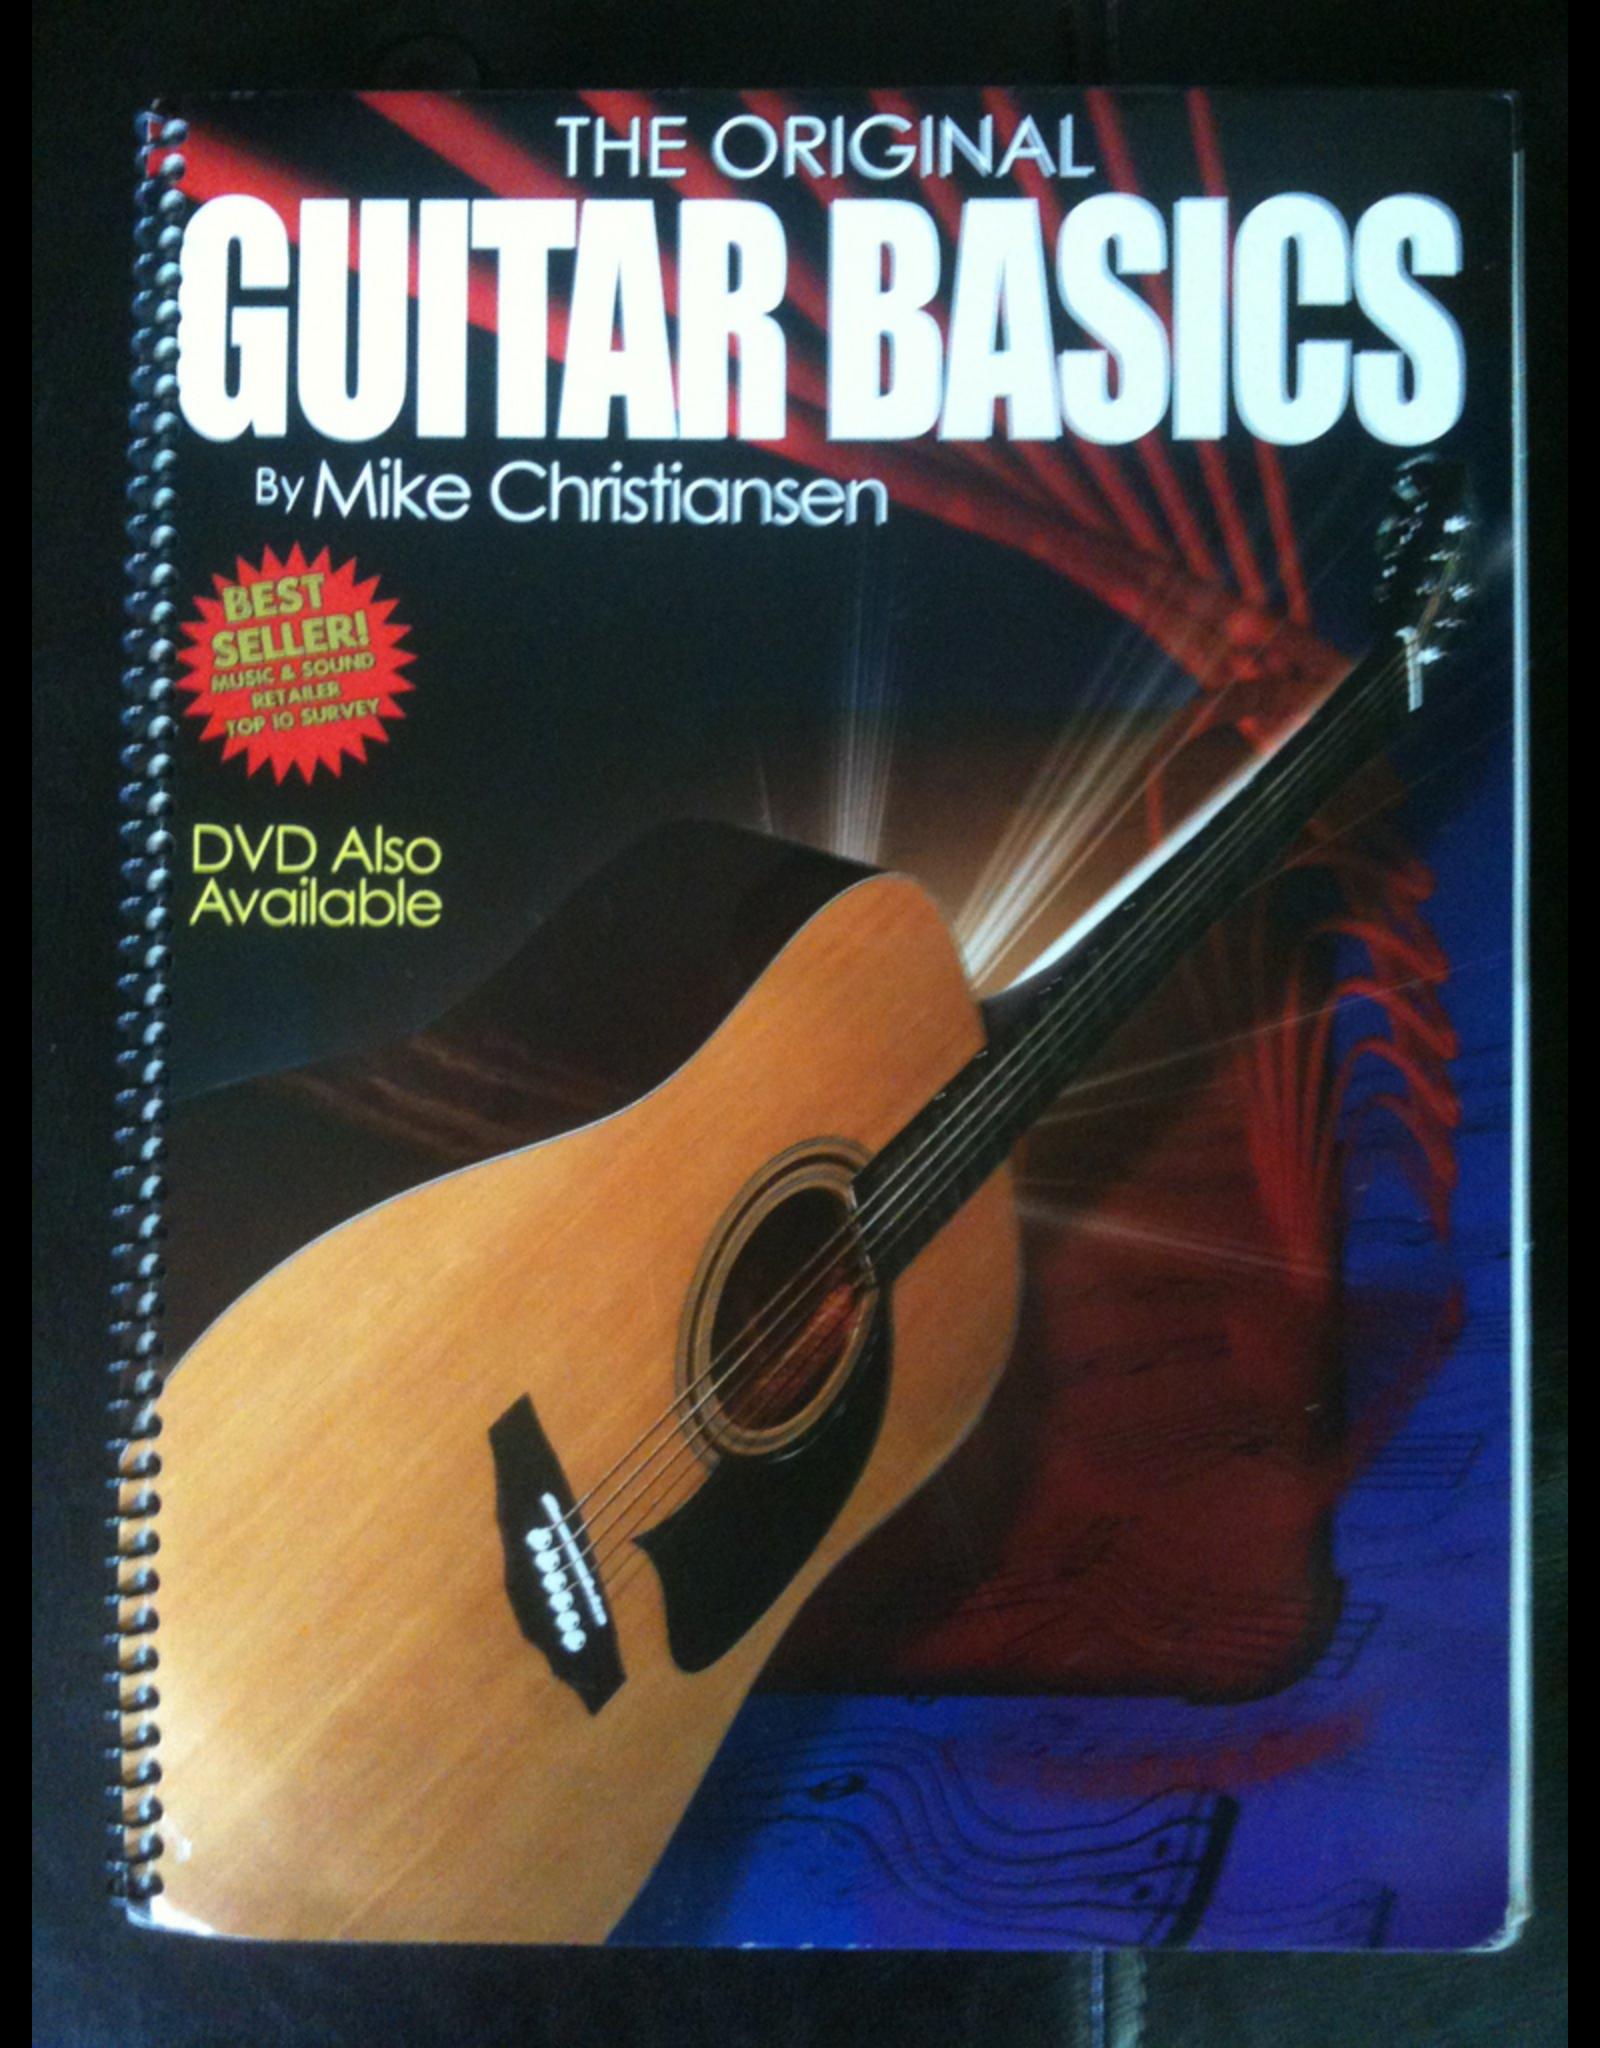 Chesbro Original Guitar Basics by Mike Christiansen